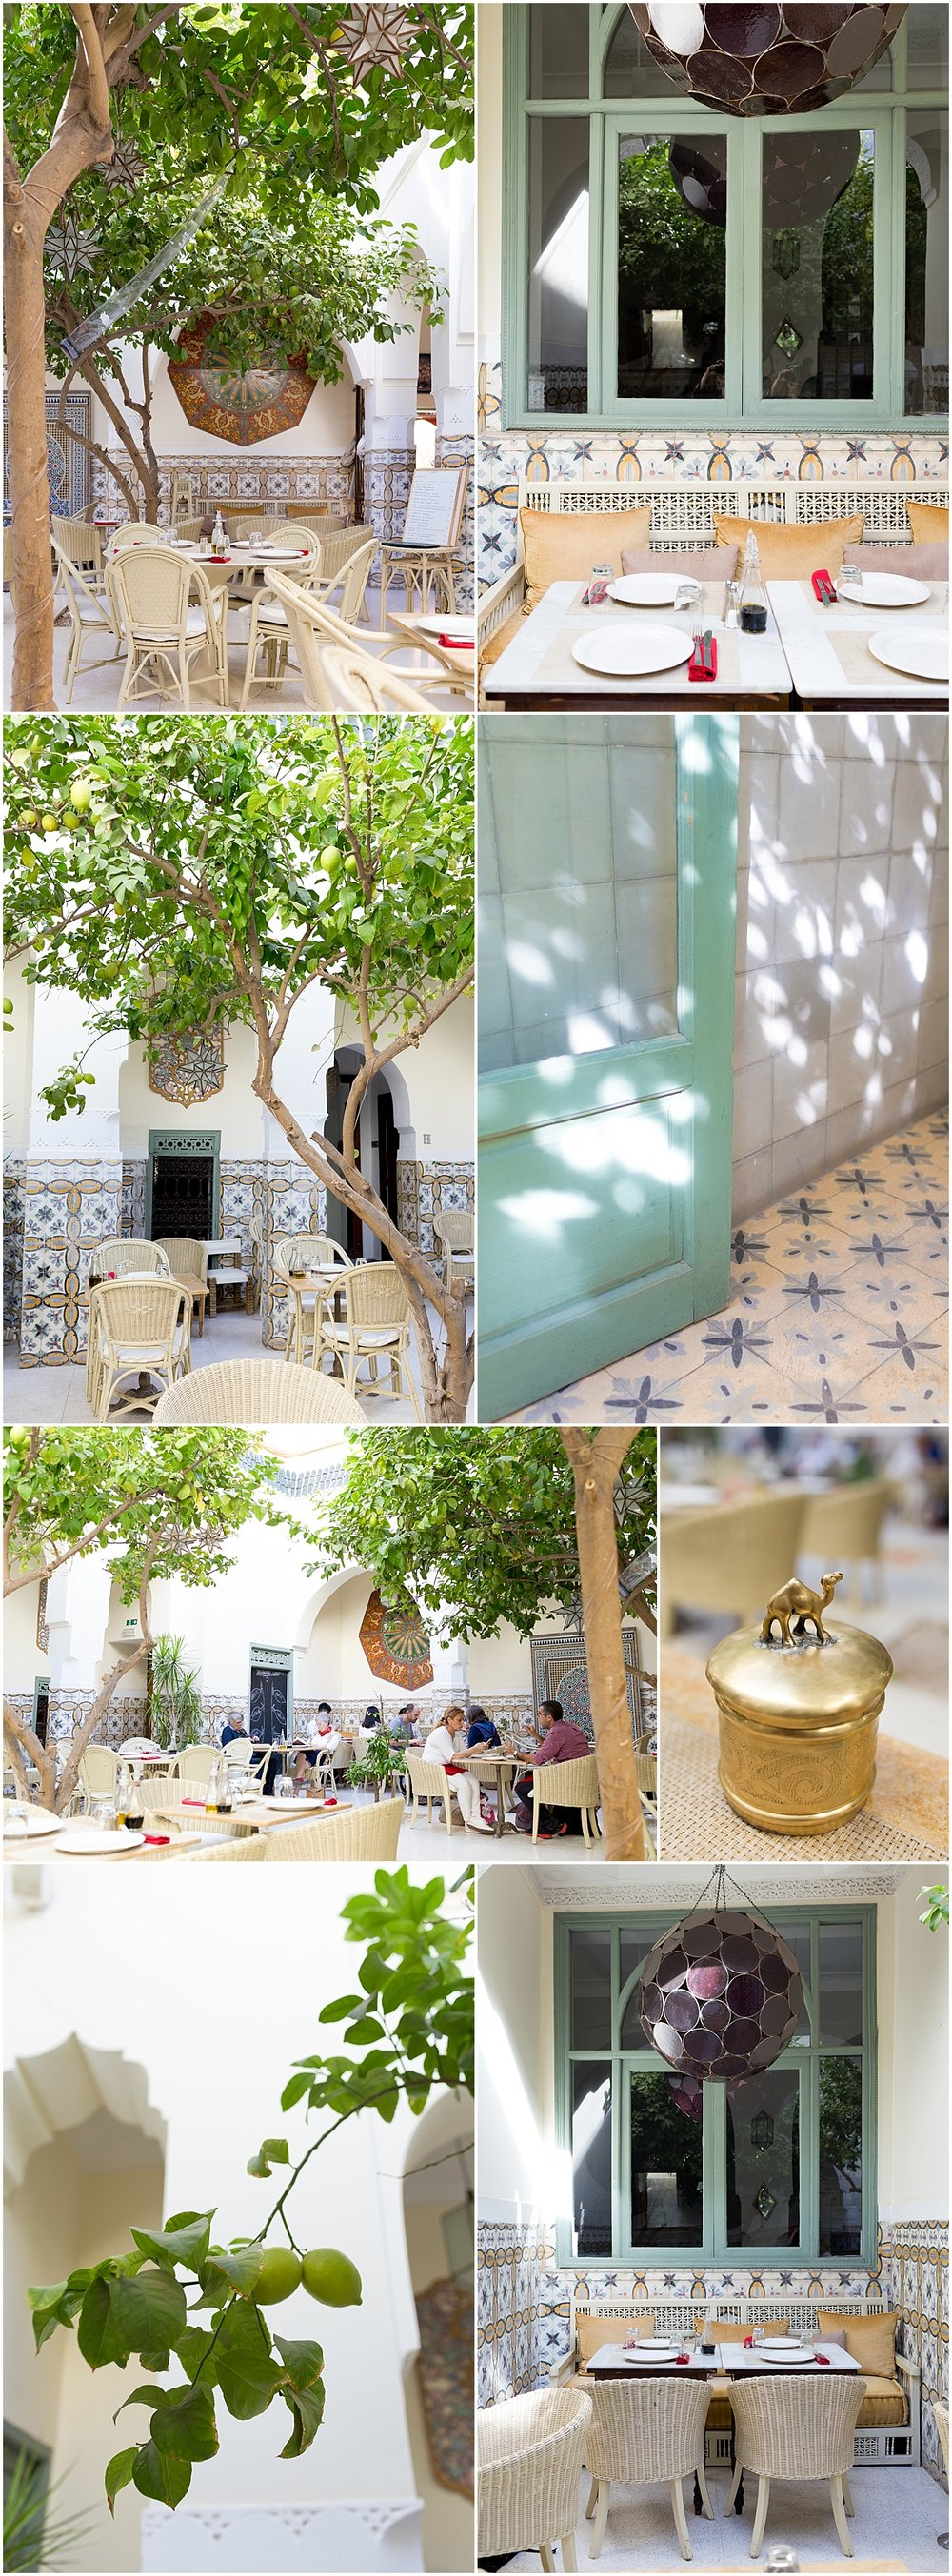 beautiful Moroccan interior at Limoni restaurant, Marrakech